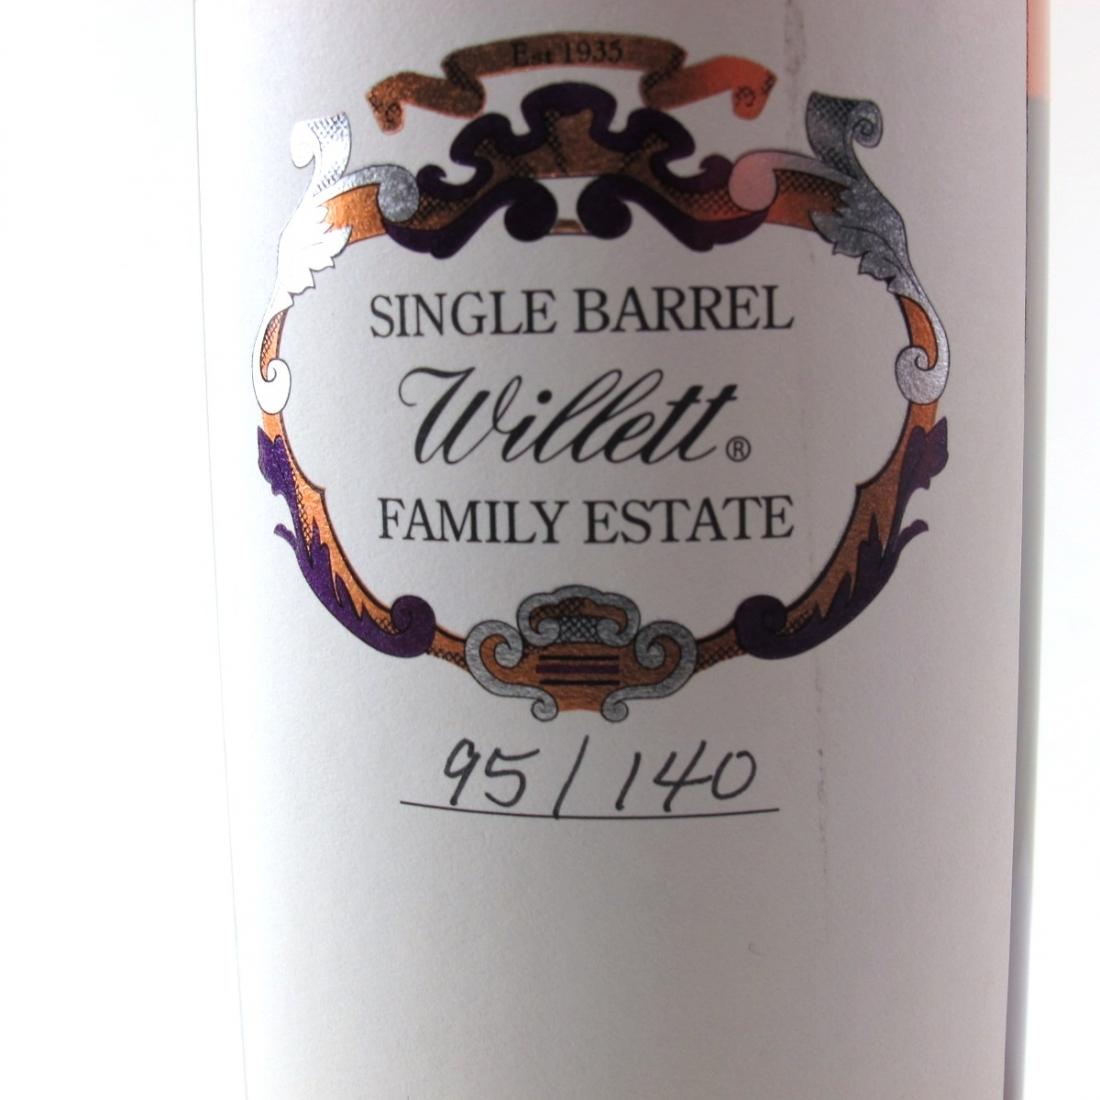 Willett Family Estate 13 Year Old Single Barrel Bourbon #747